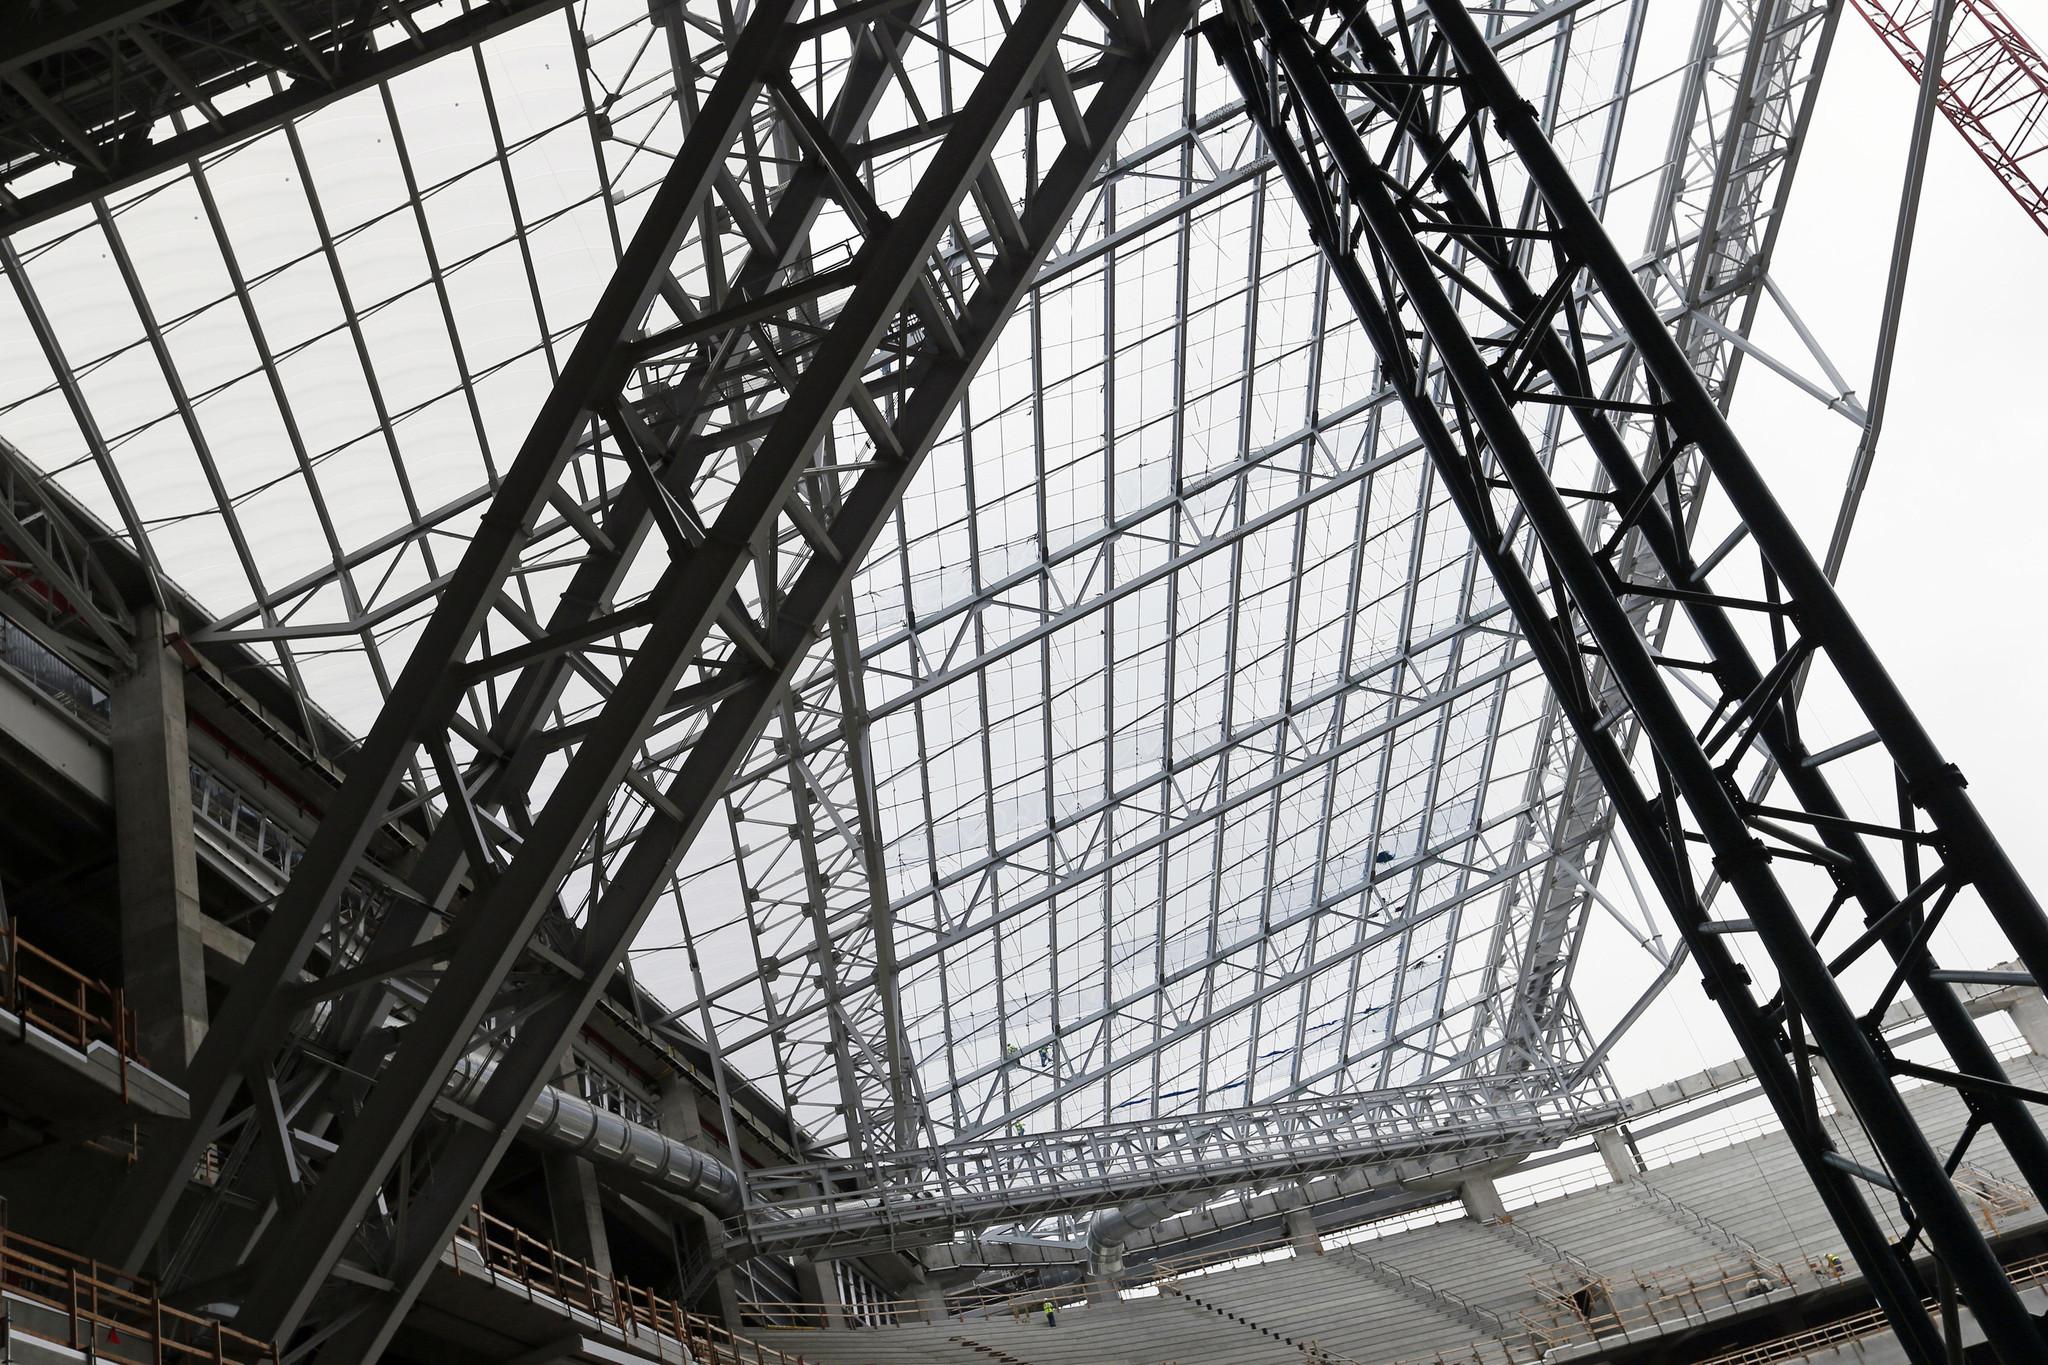 Innovative Roof Makes Vikings Stadium Lighten Up